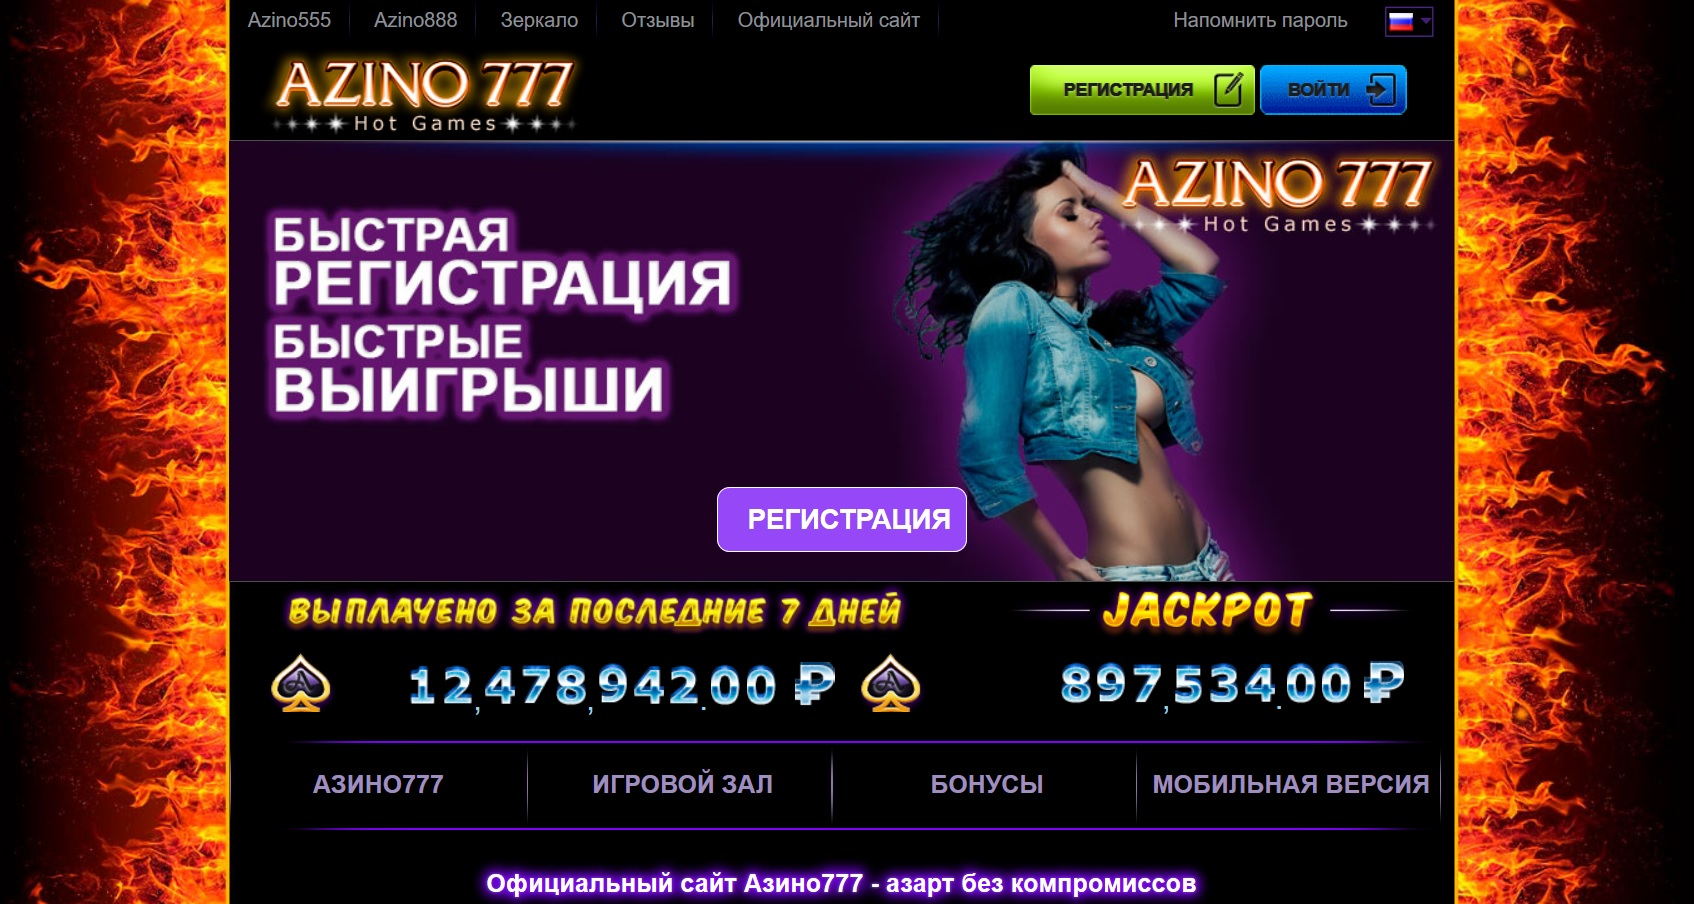 azino официальный сайт мобайл